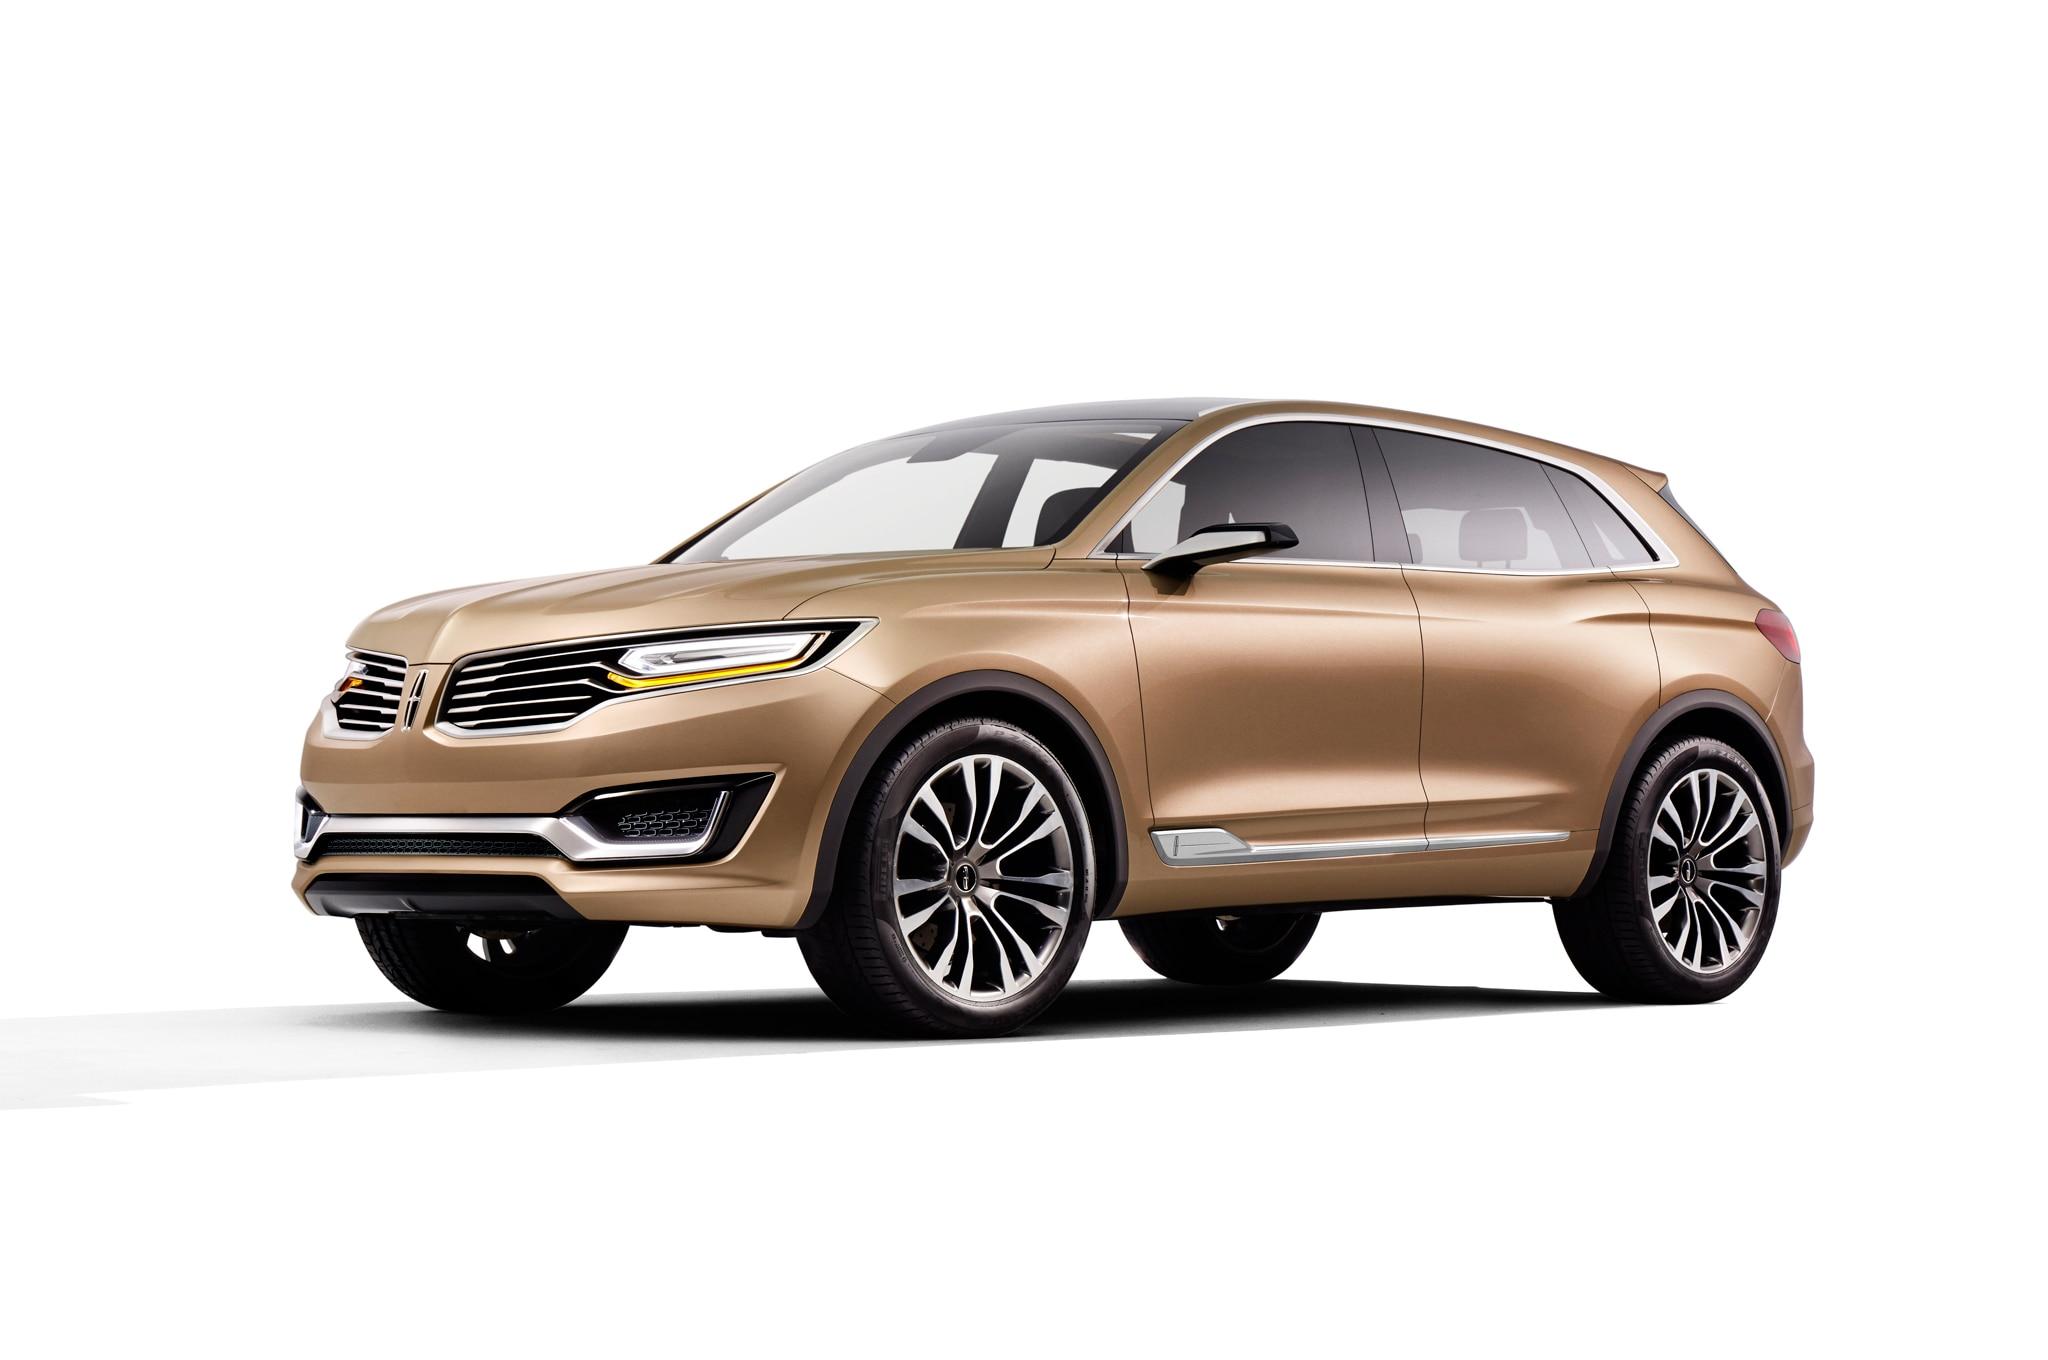 http://st.automobilemag.com/uploads/sites/11/2014/04/Lincoln-MKX-Concept-front-three-quarter-02.jpg